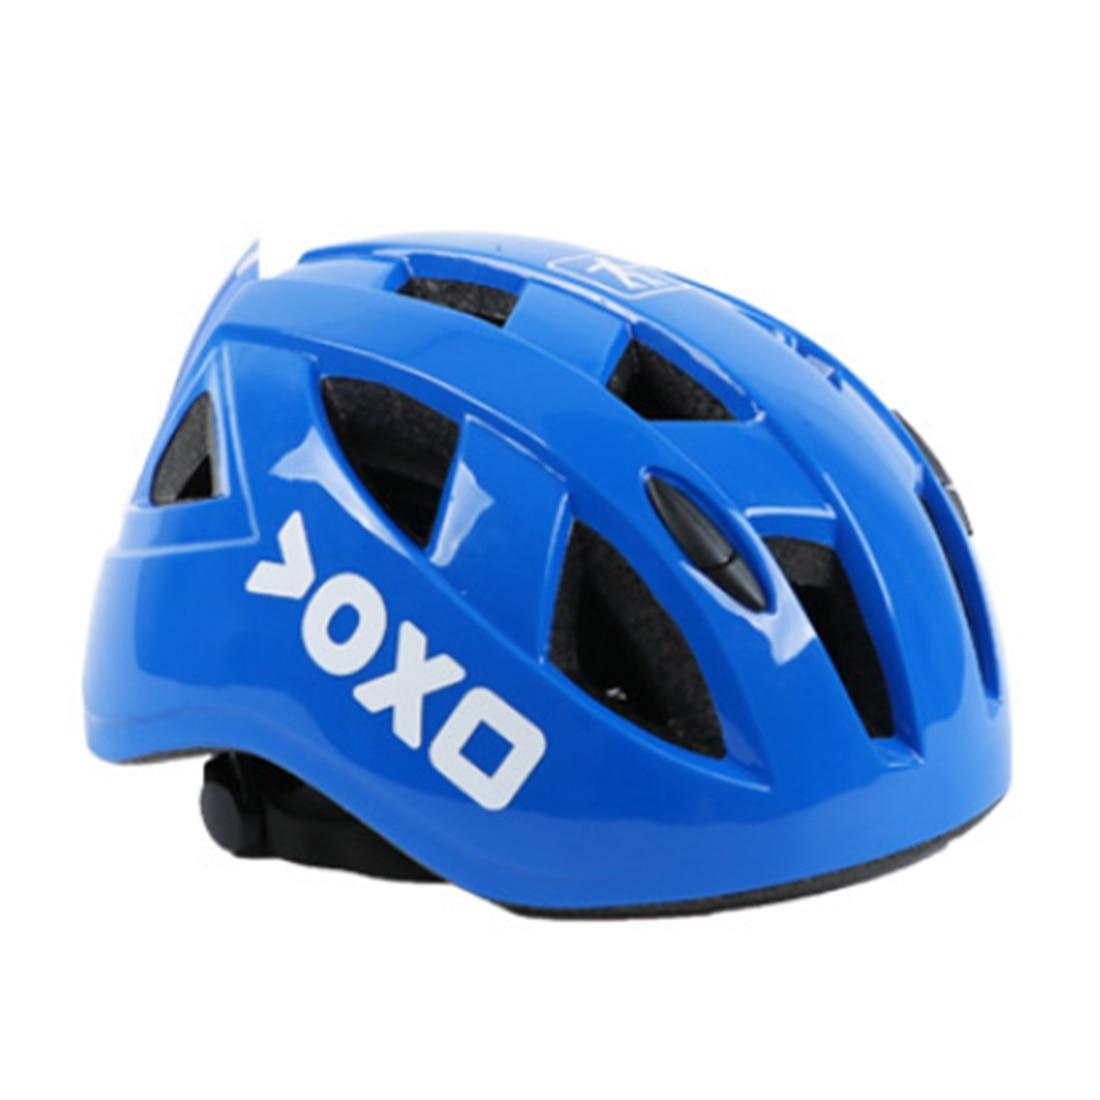 Aliexpress Buy Children Bicycle Helmet Safety